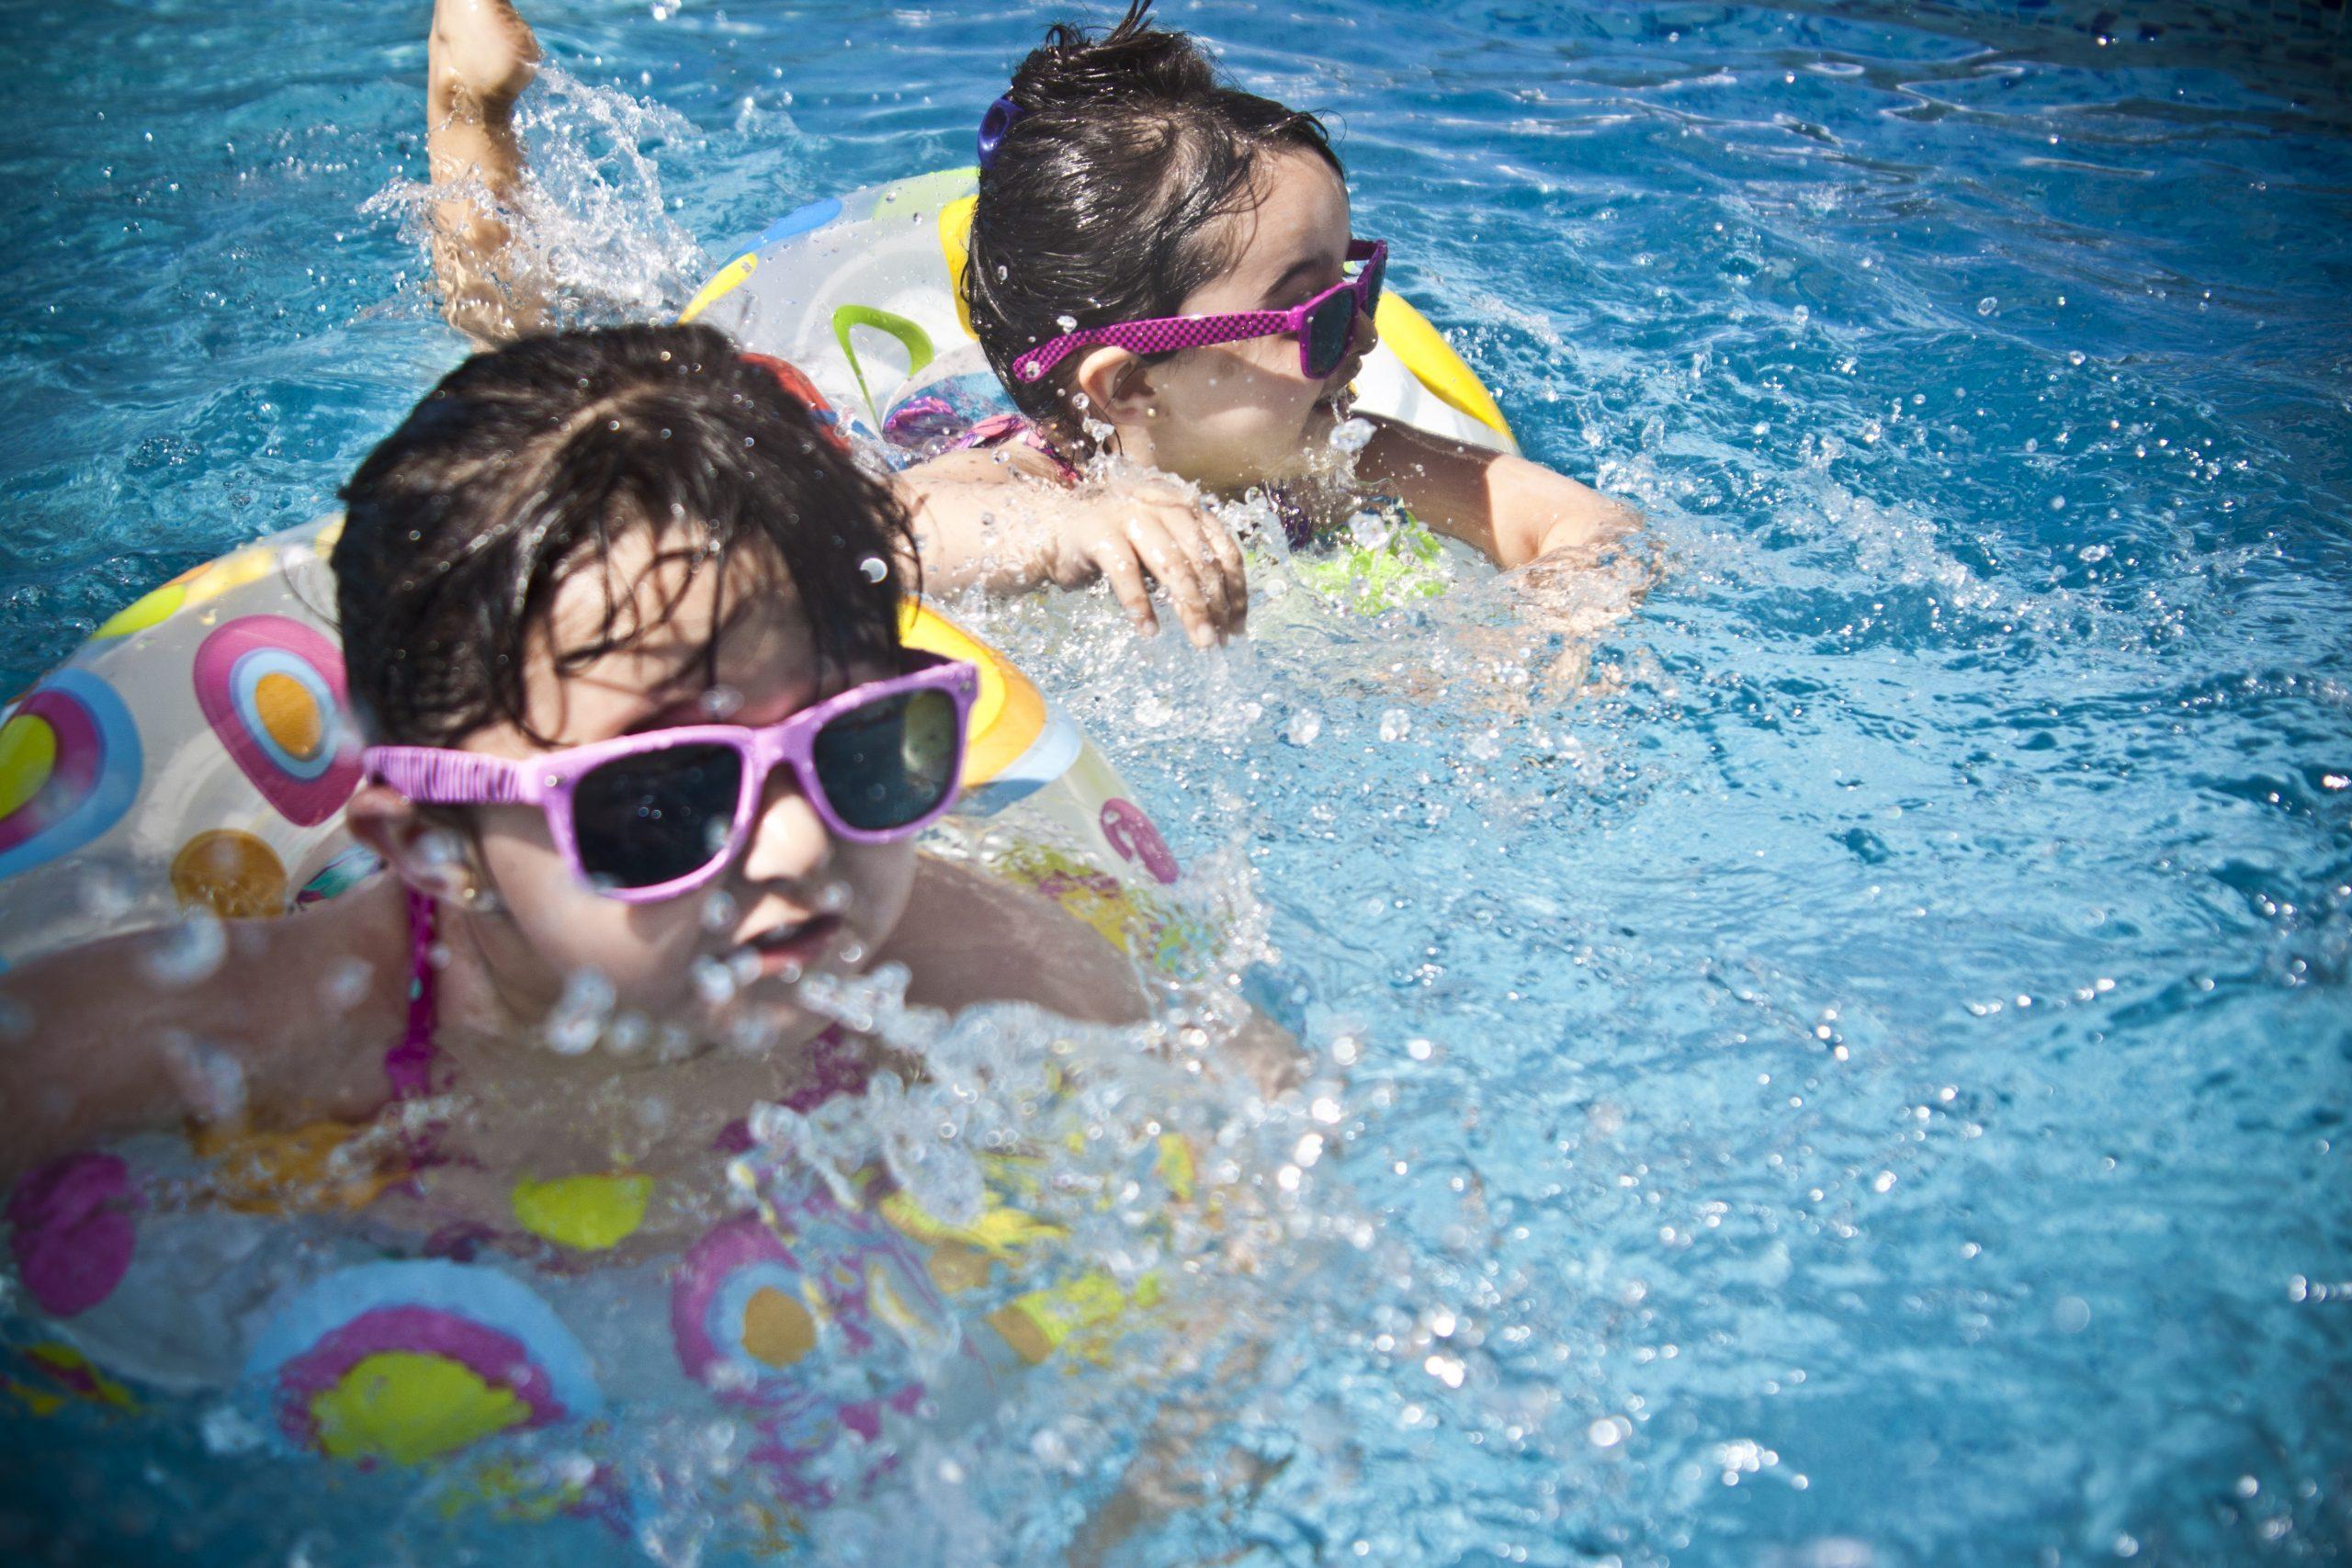 2 girl s swimming during daytime